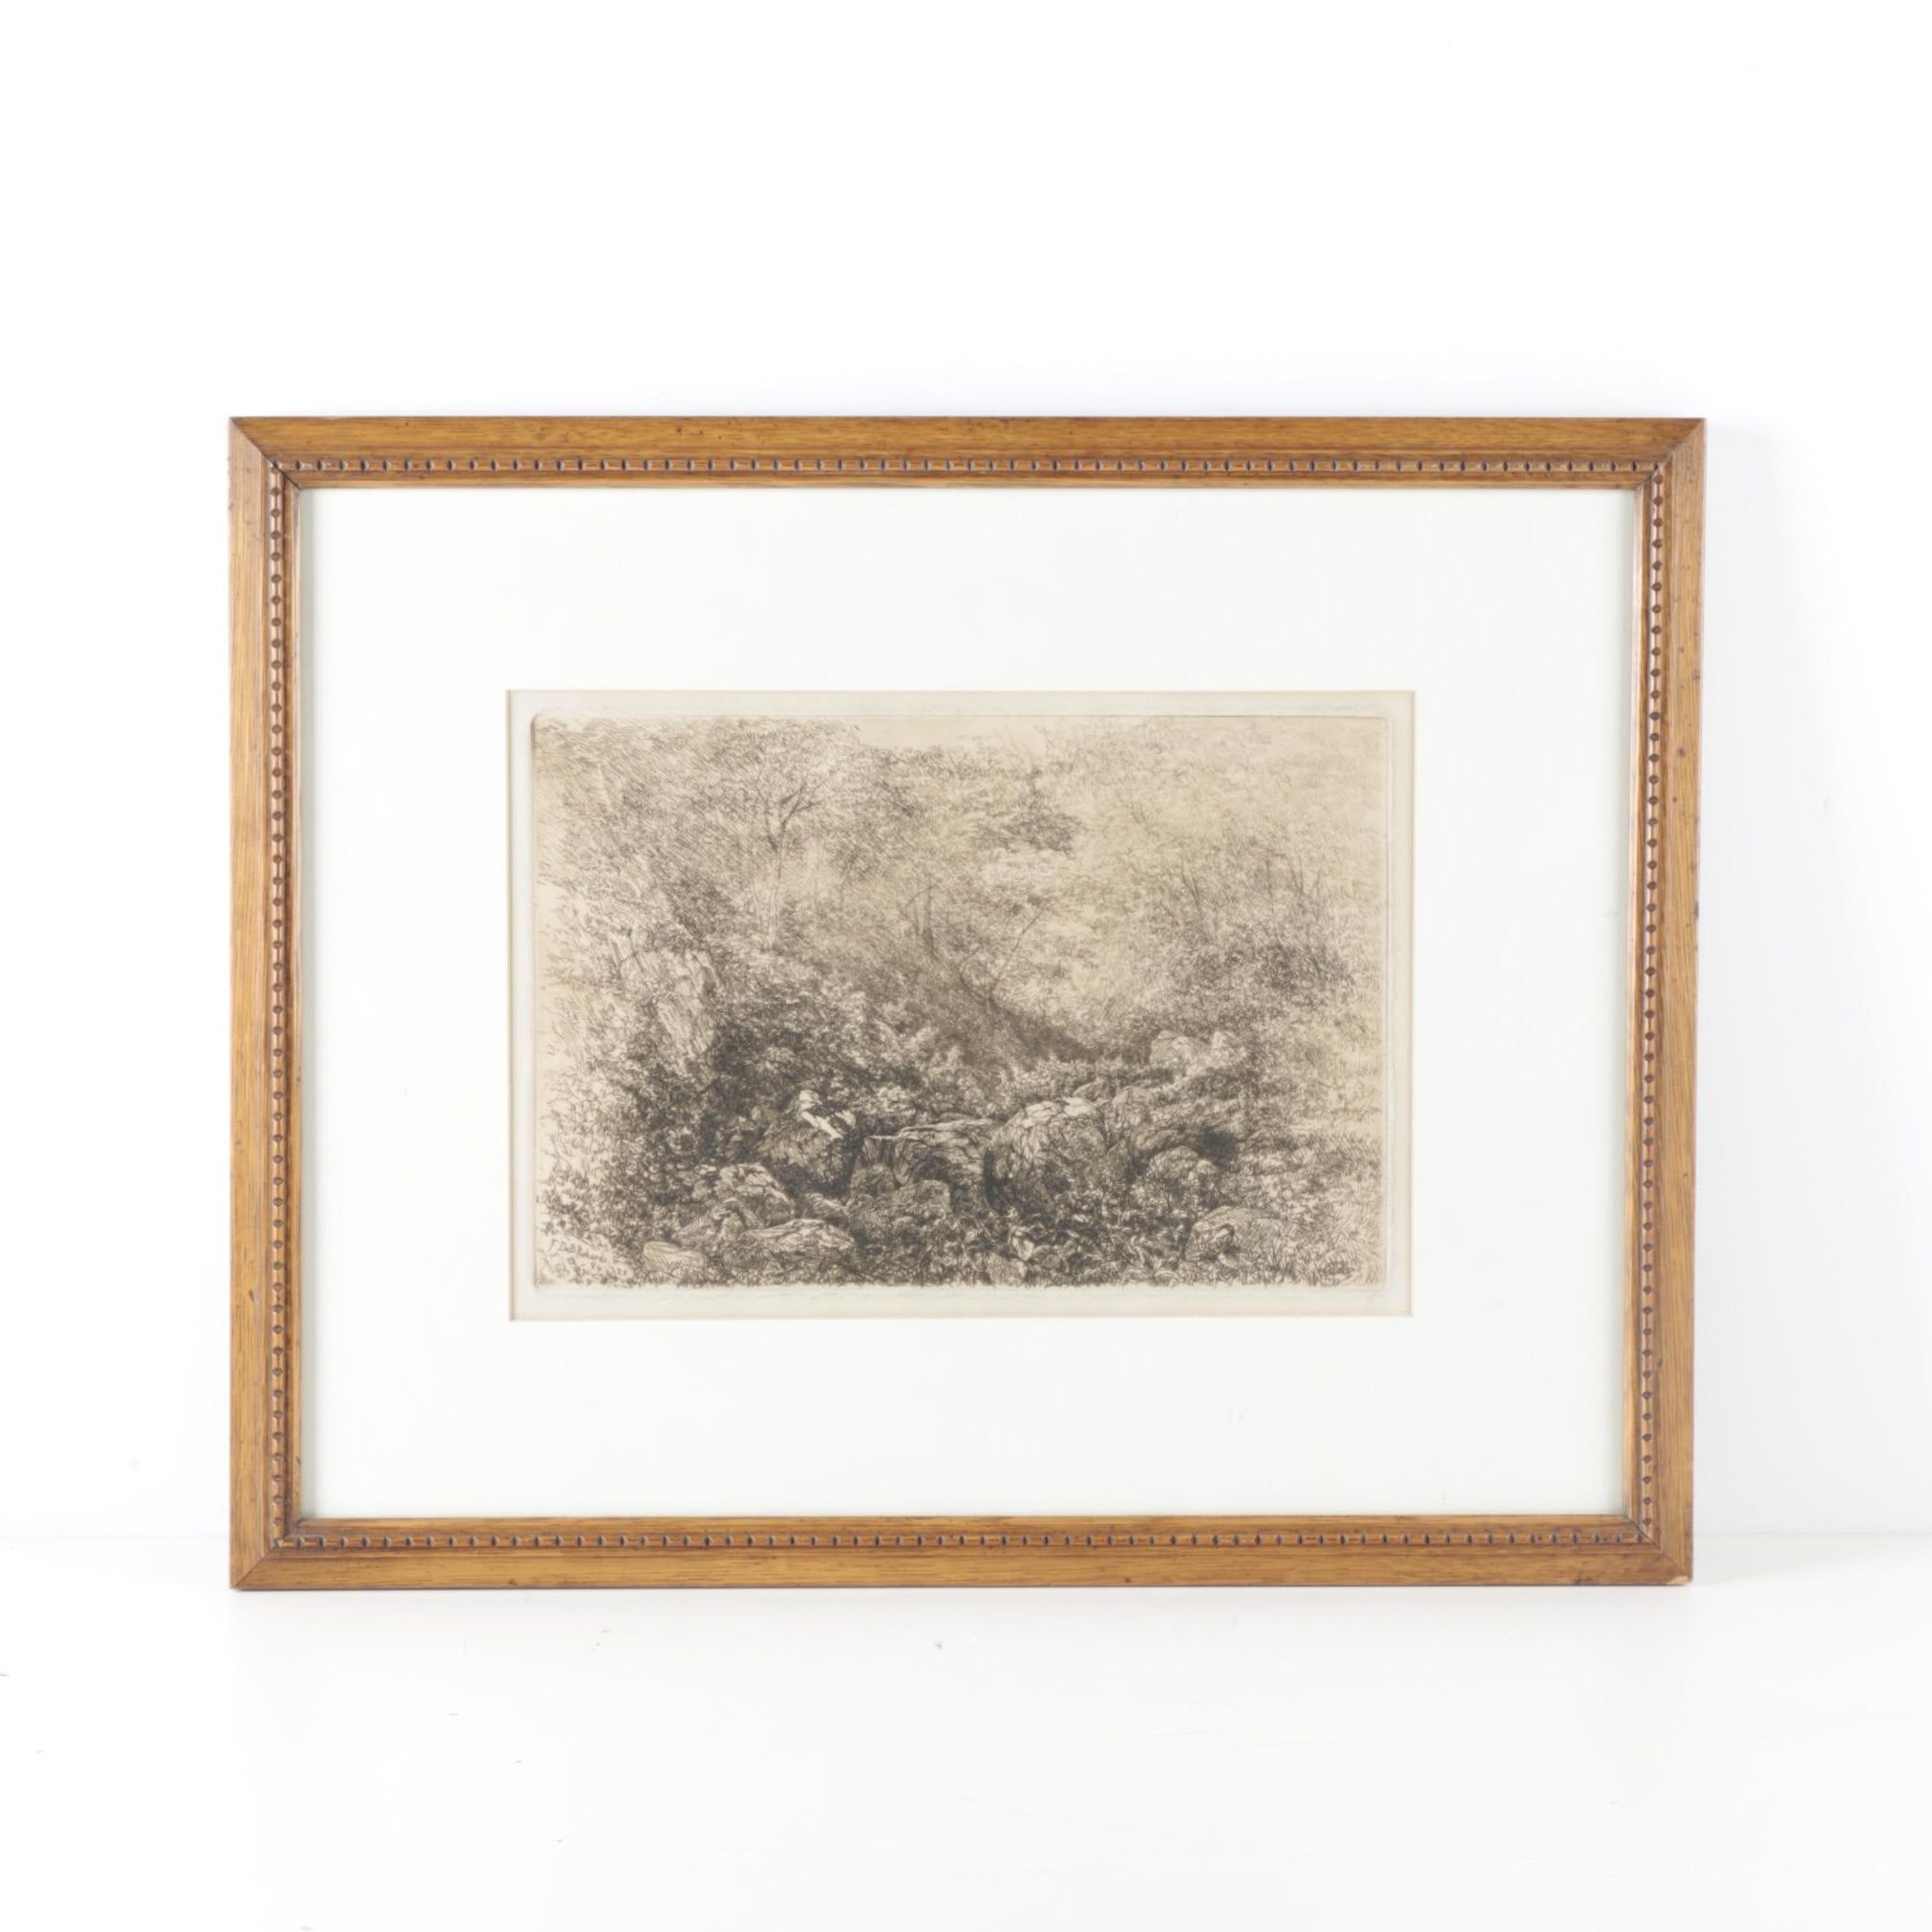 F. Deb. Richards Etching on Paper of Landscape